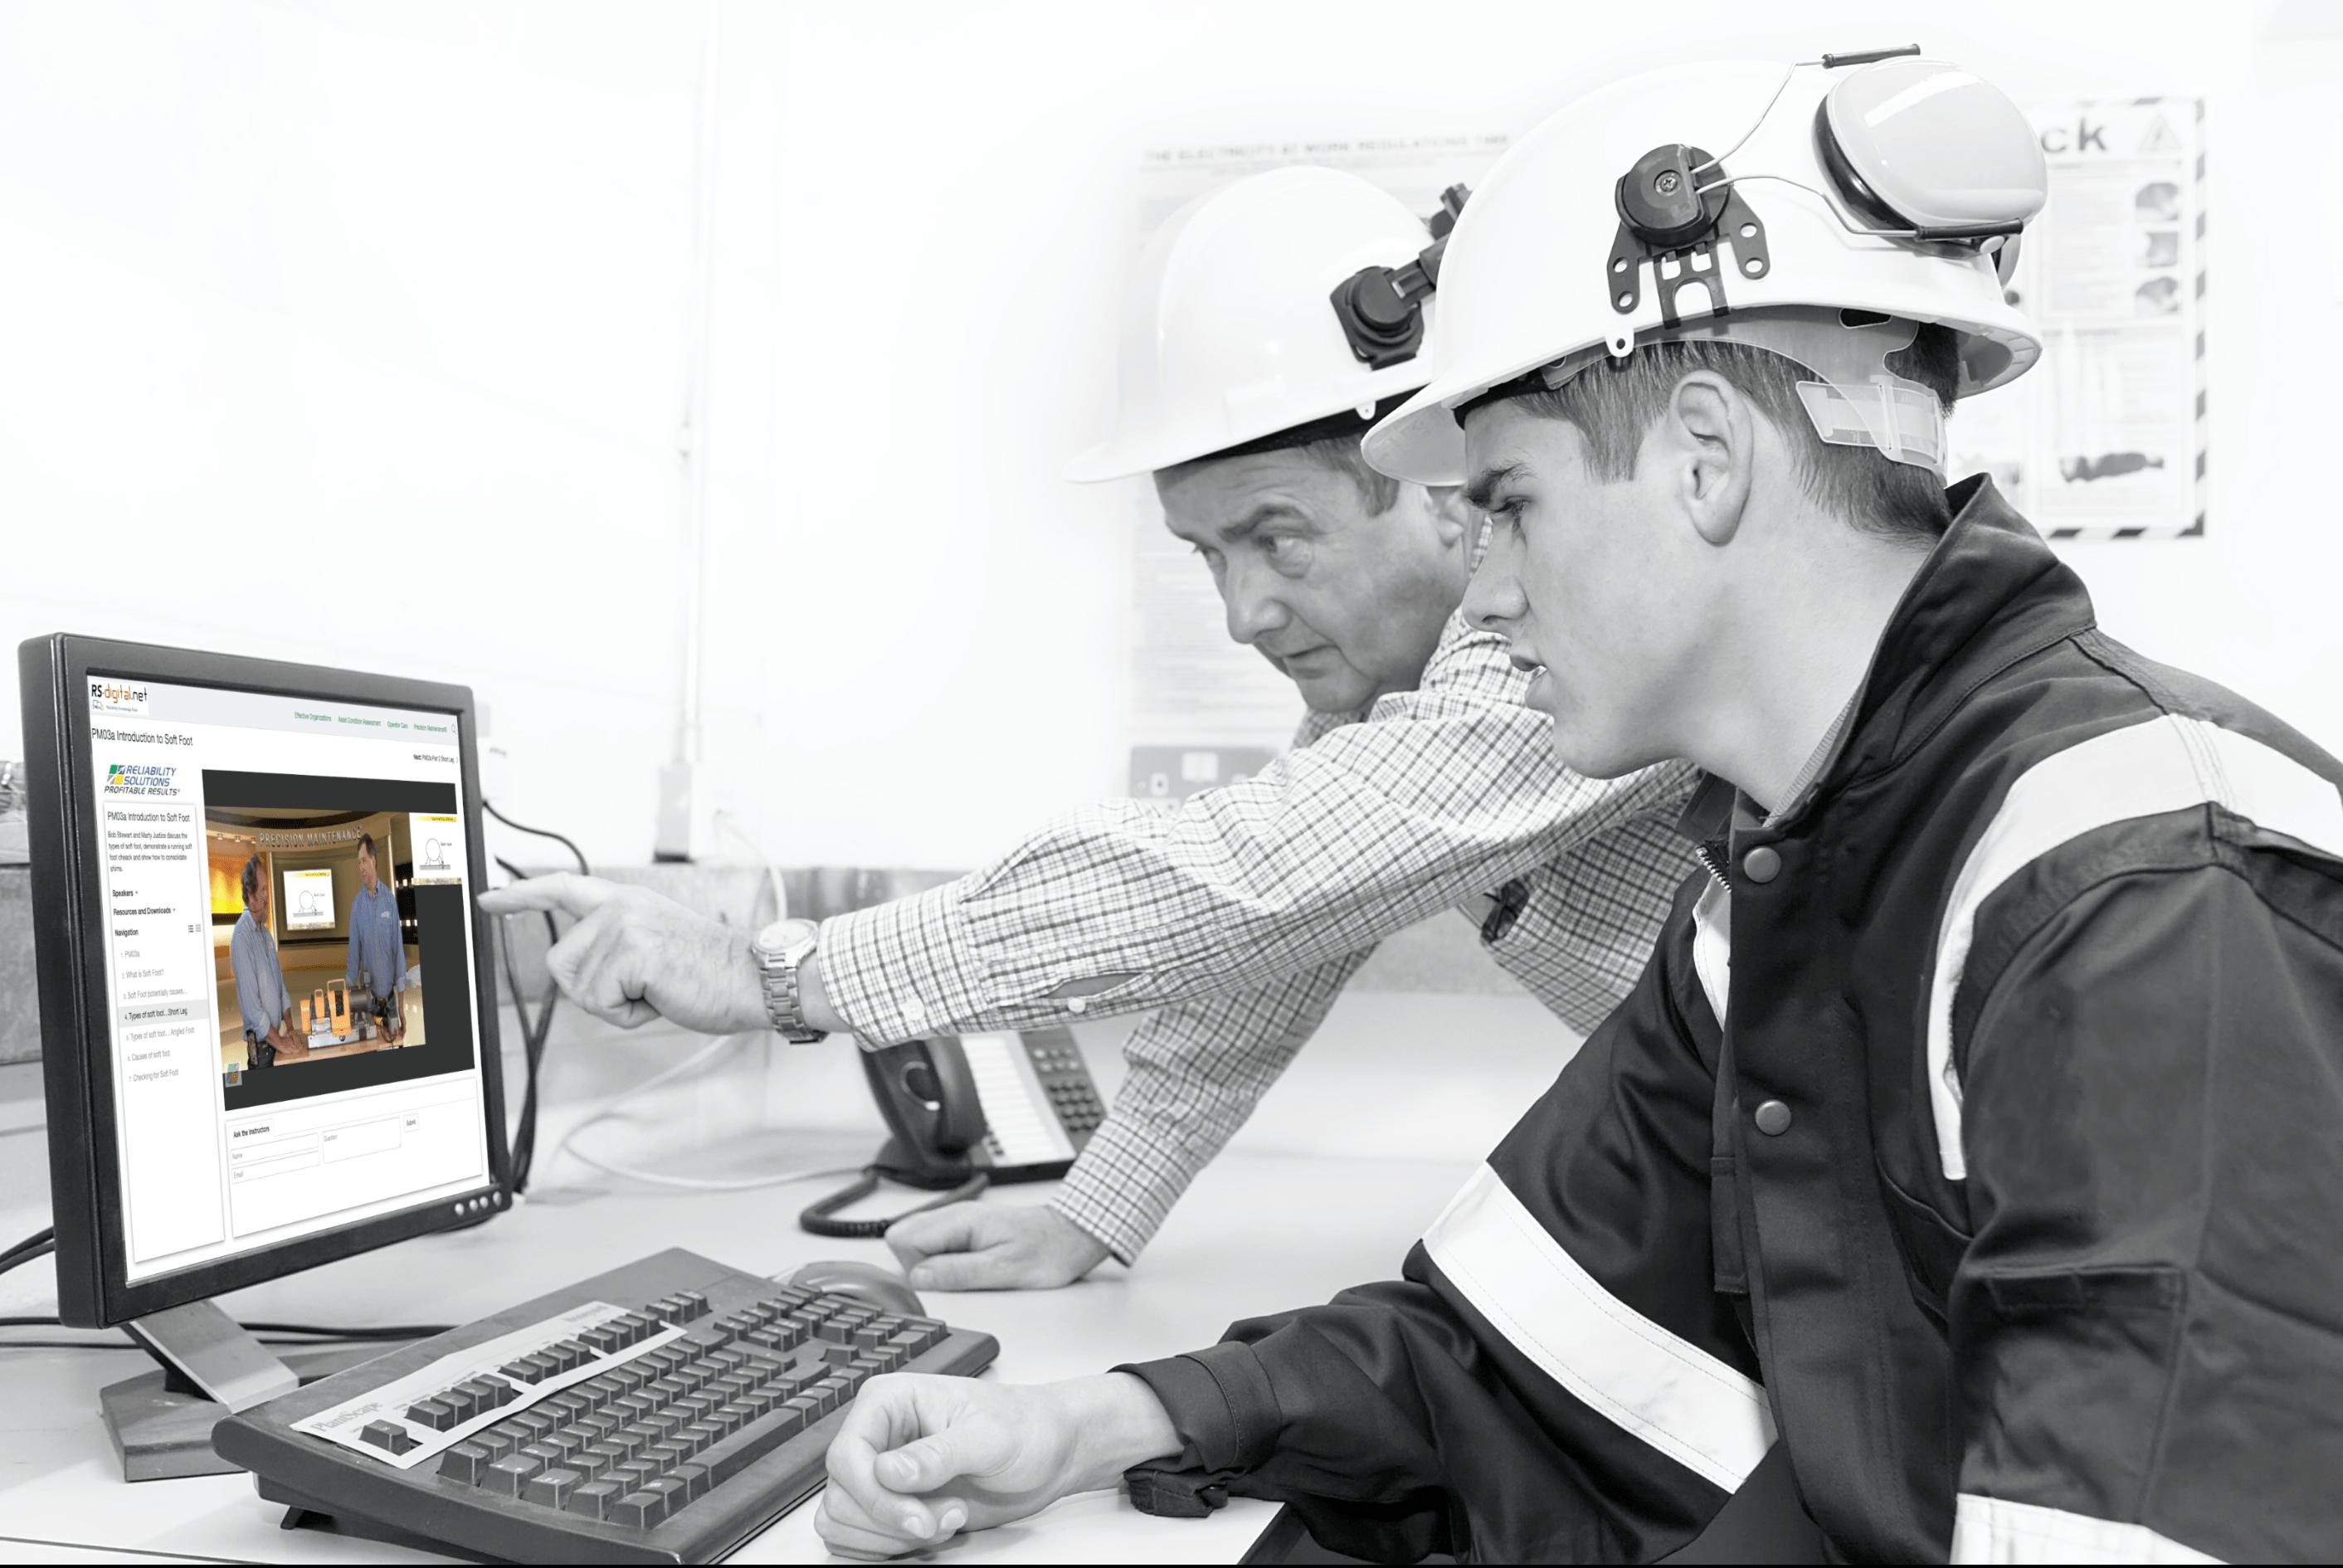 Online Reliability Training